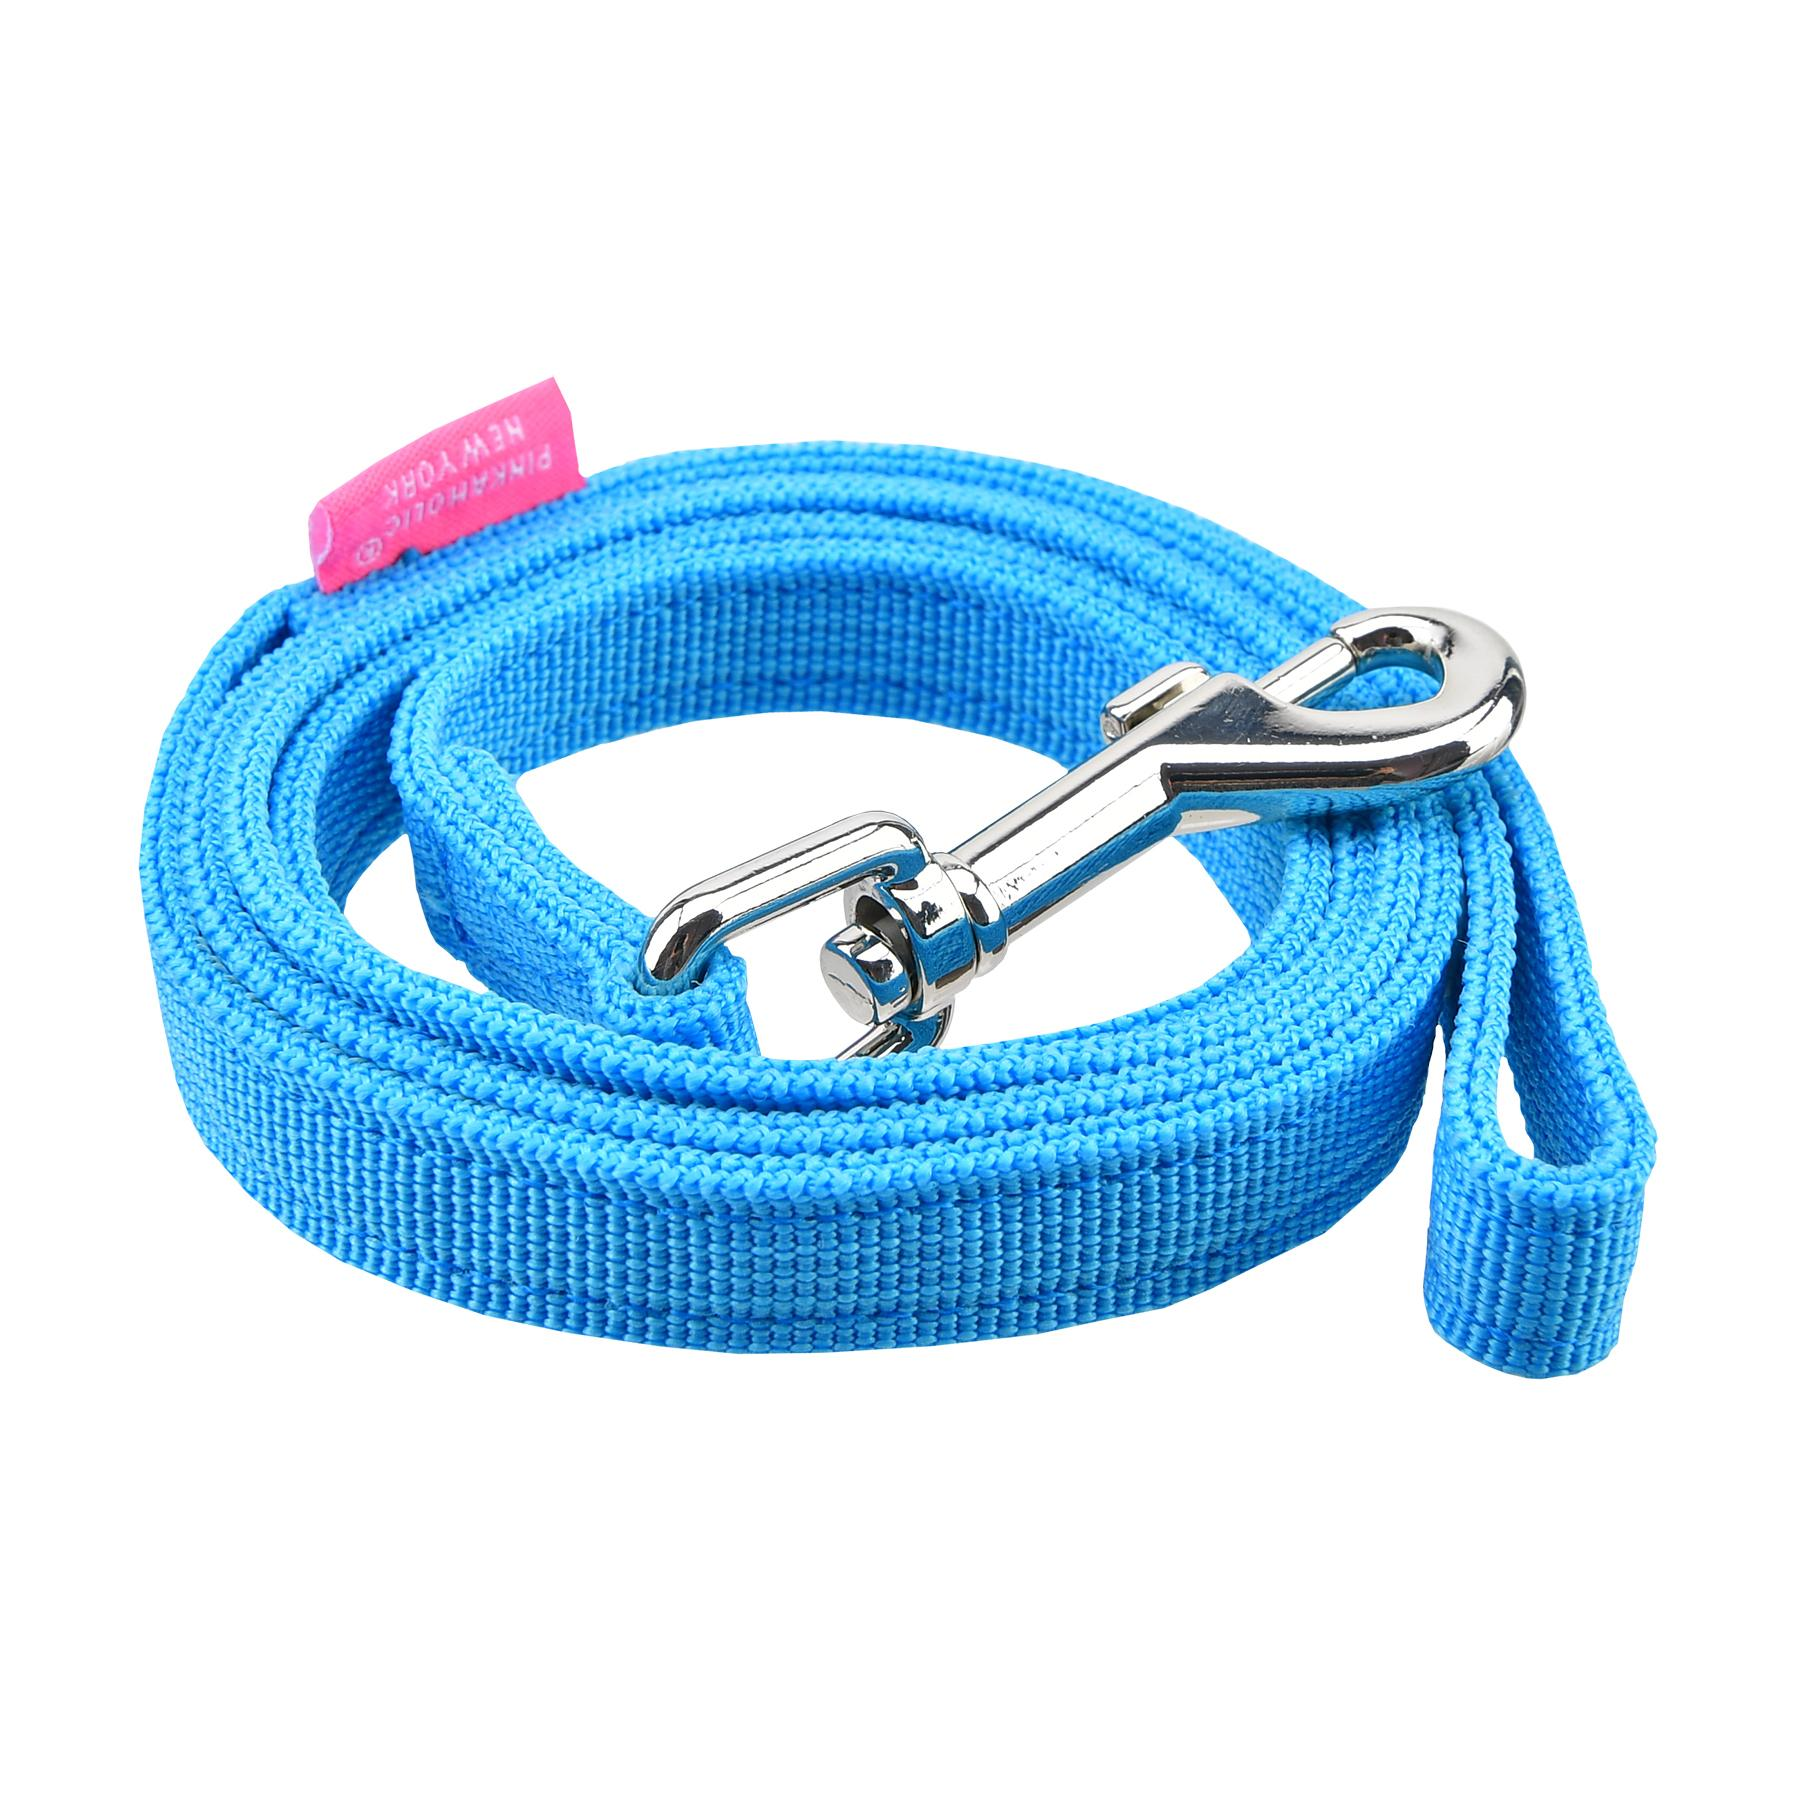 Niki Dog Leash By Pinkaholic - Sky Blue